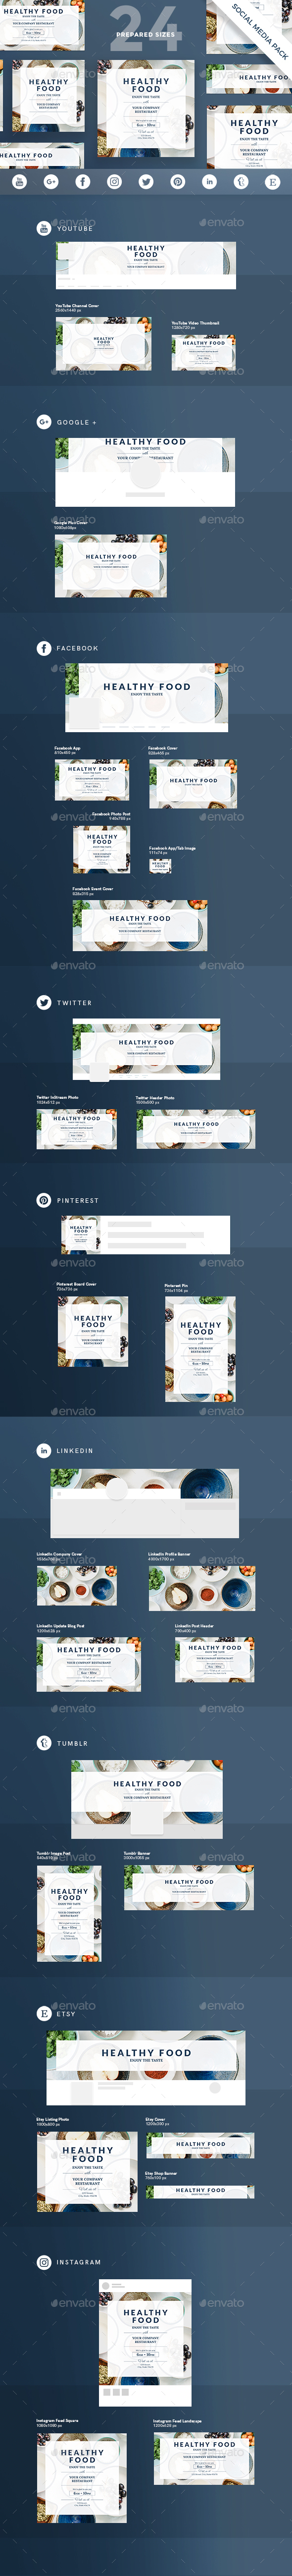 Healthy Food Social Media Pack - Miscellaneous Social Media